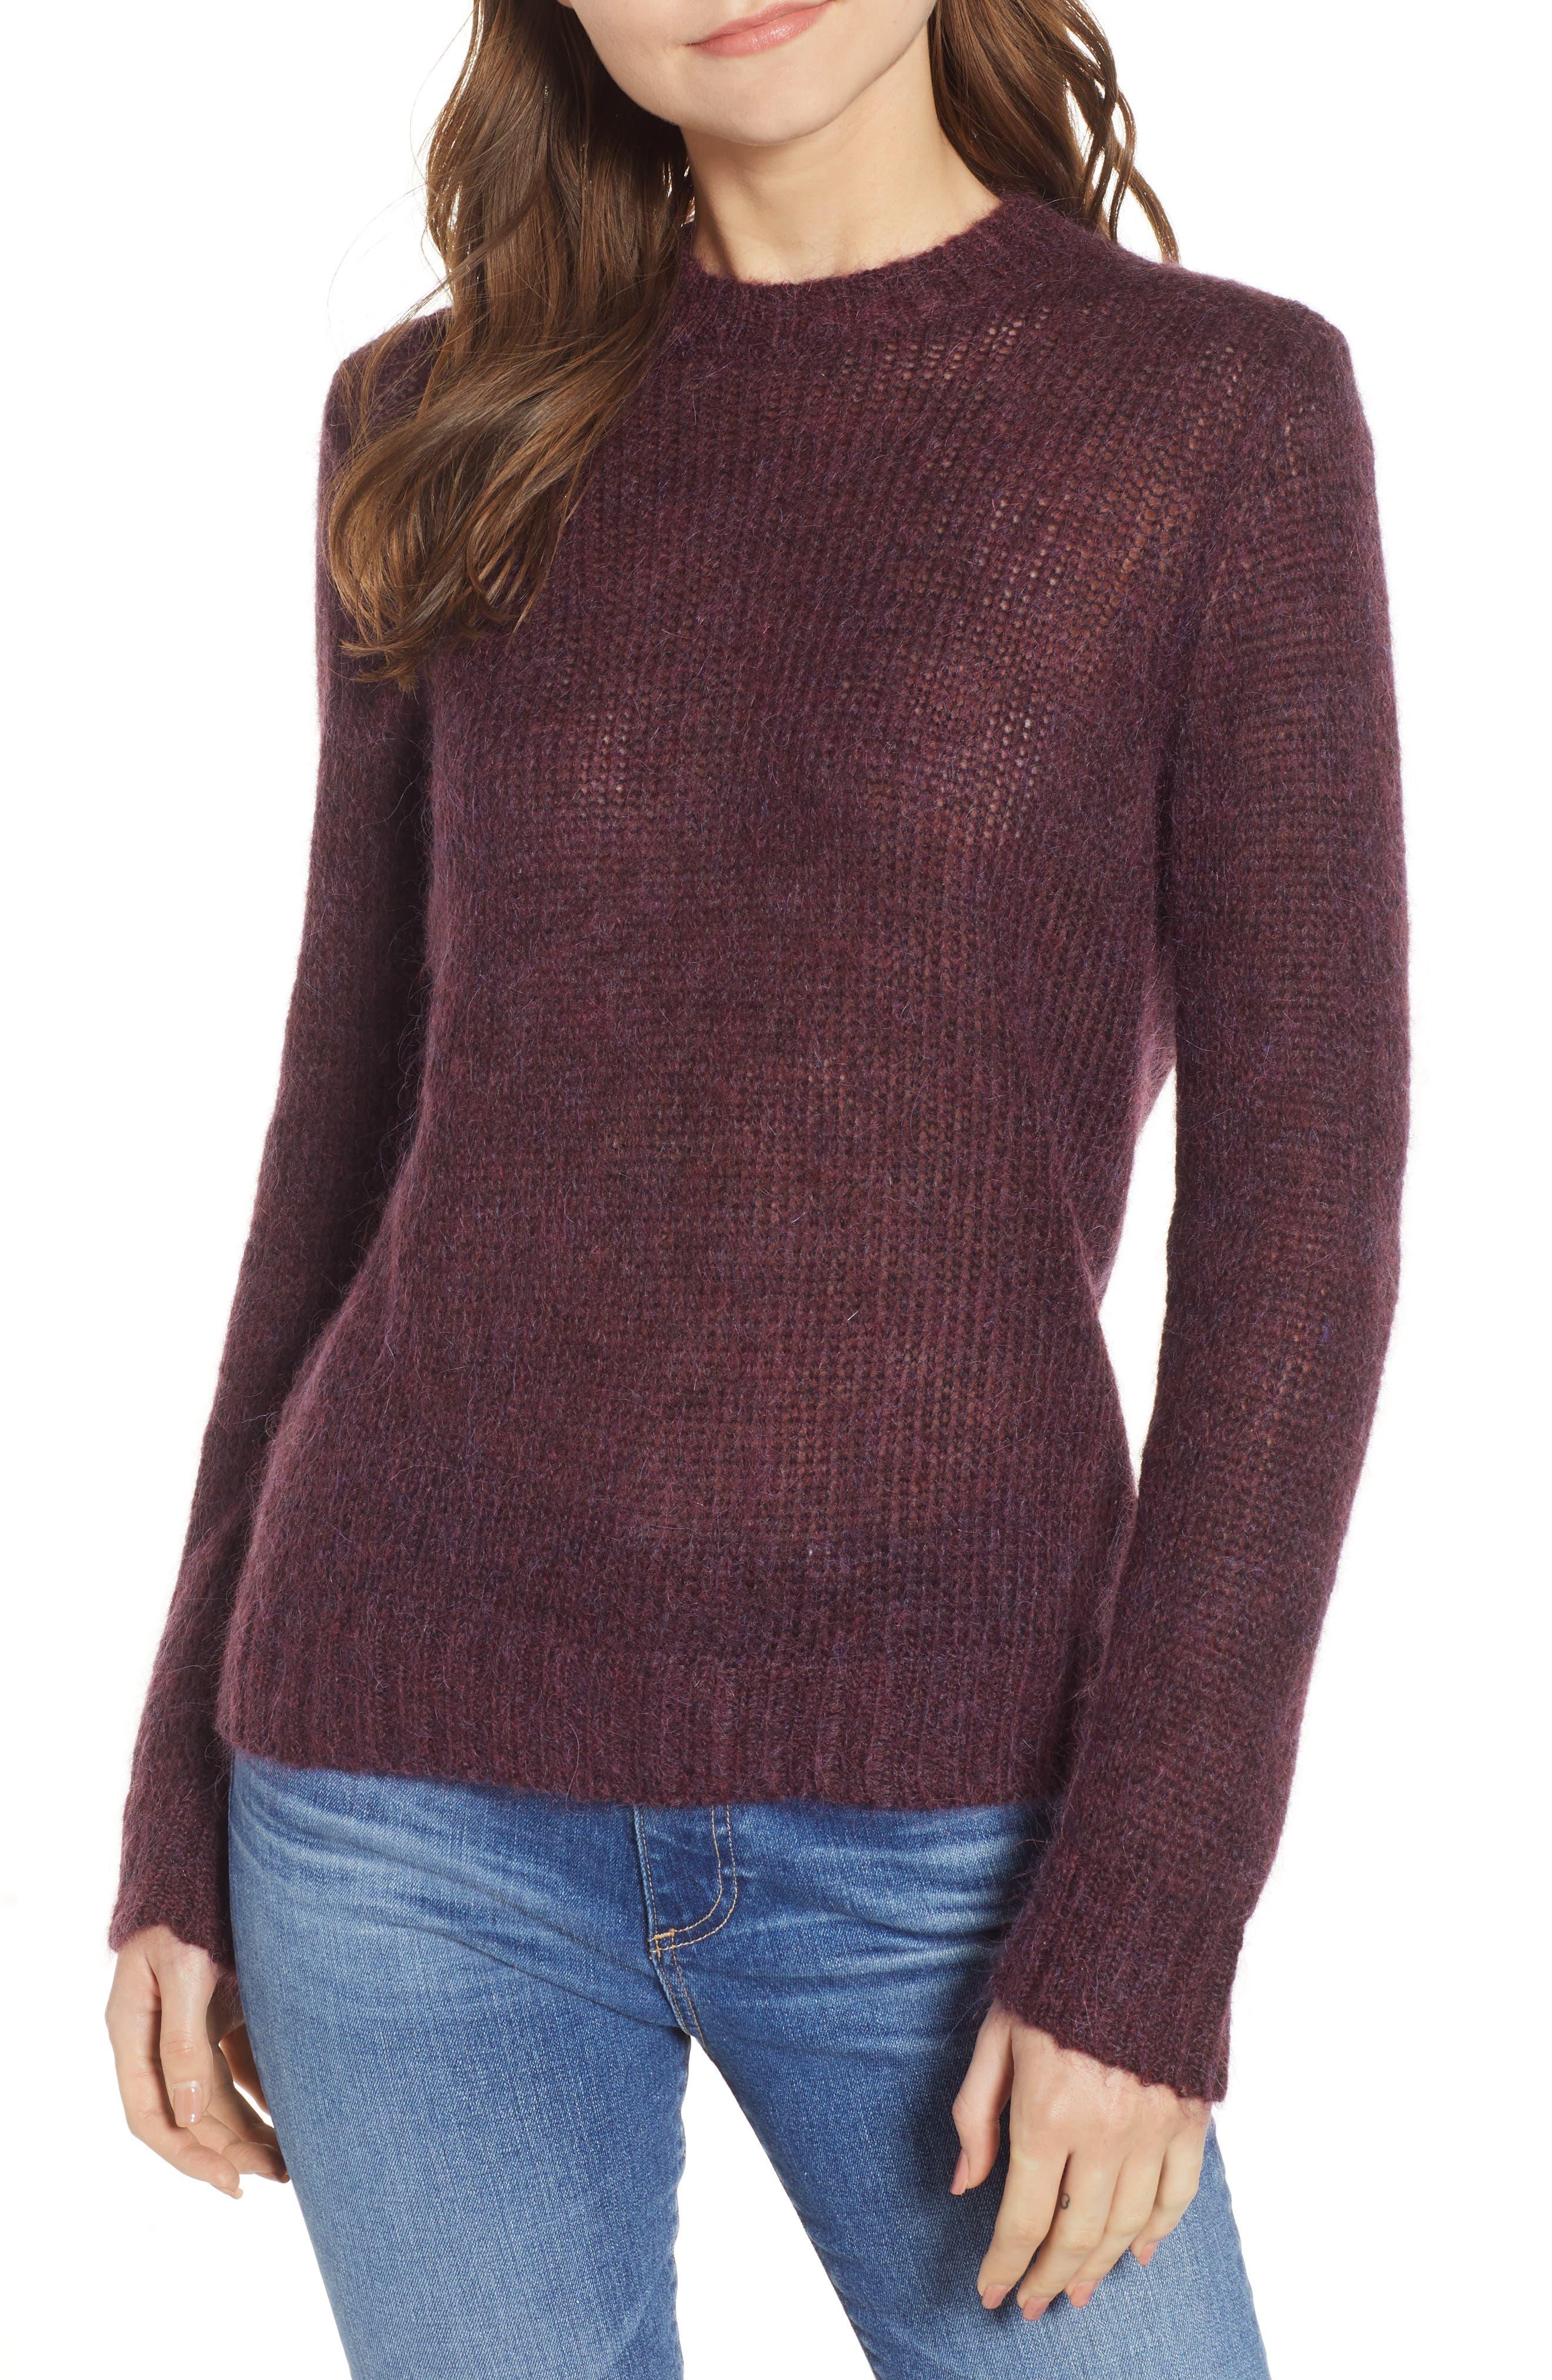 Ansley Crewneck Sweater,                             Main thumbnail 1, color,                             930